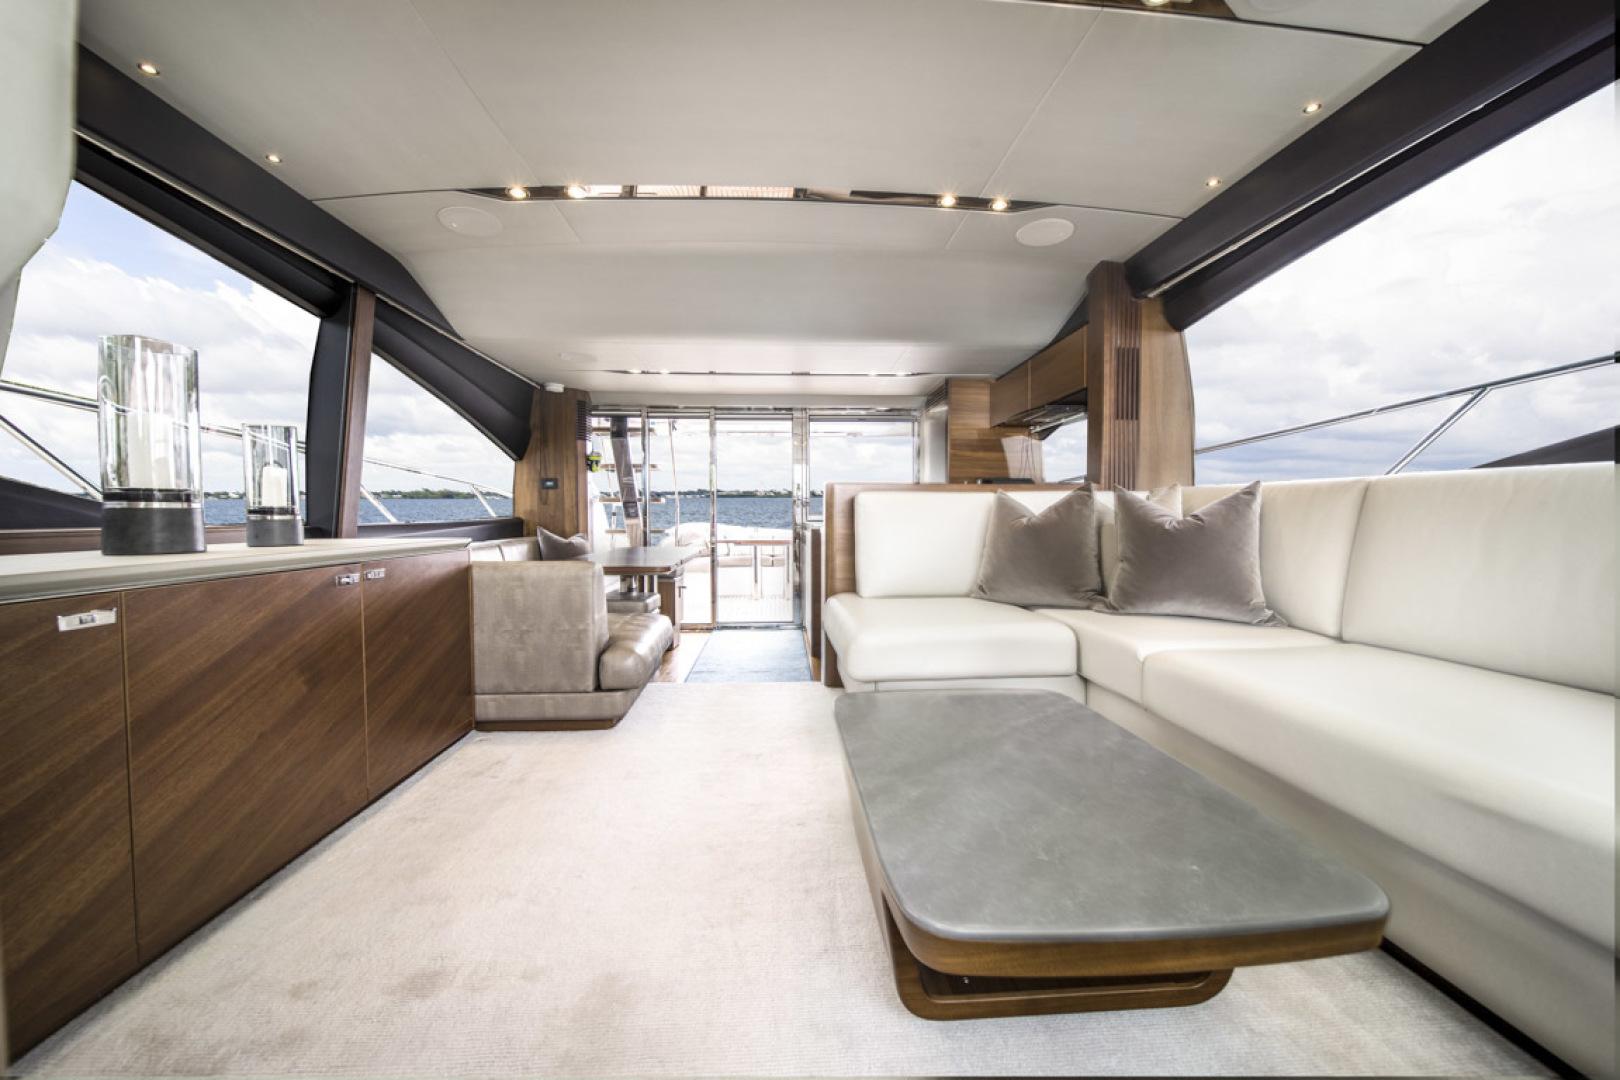 Princess-S65 2019-Paragon Cape Coral-Florida-United States-2019 65 Princess S65-Paragon-Salon-1509915 | Thumbnail